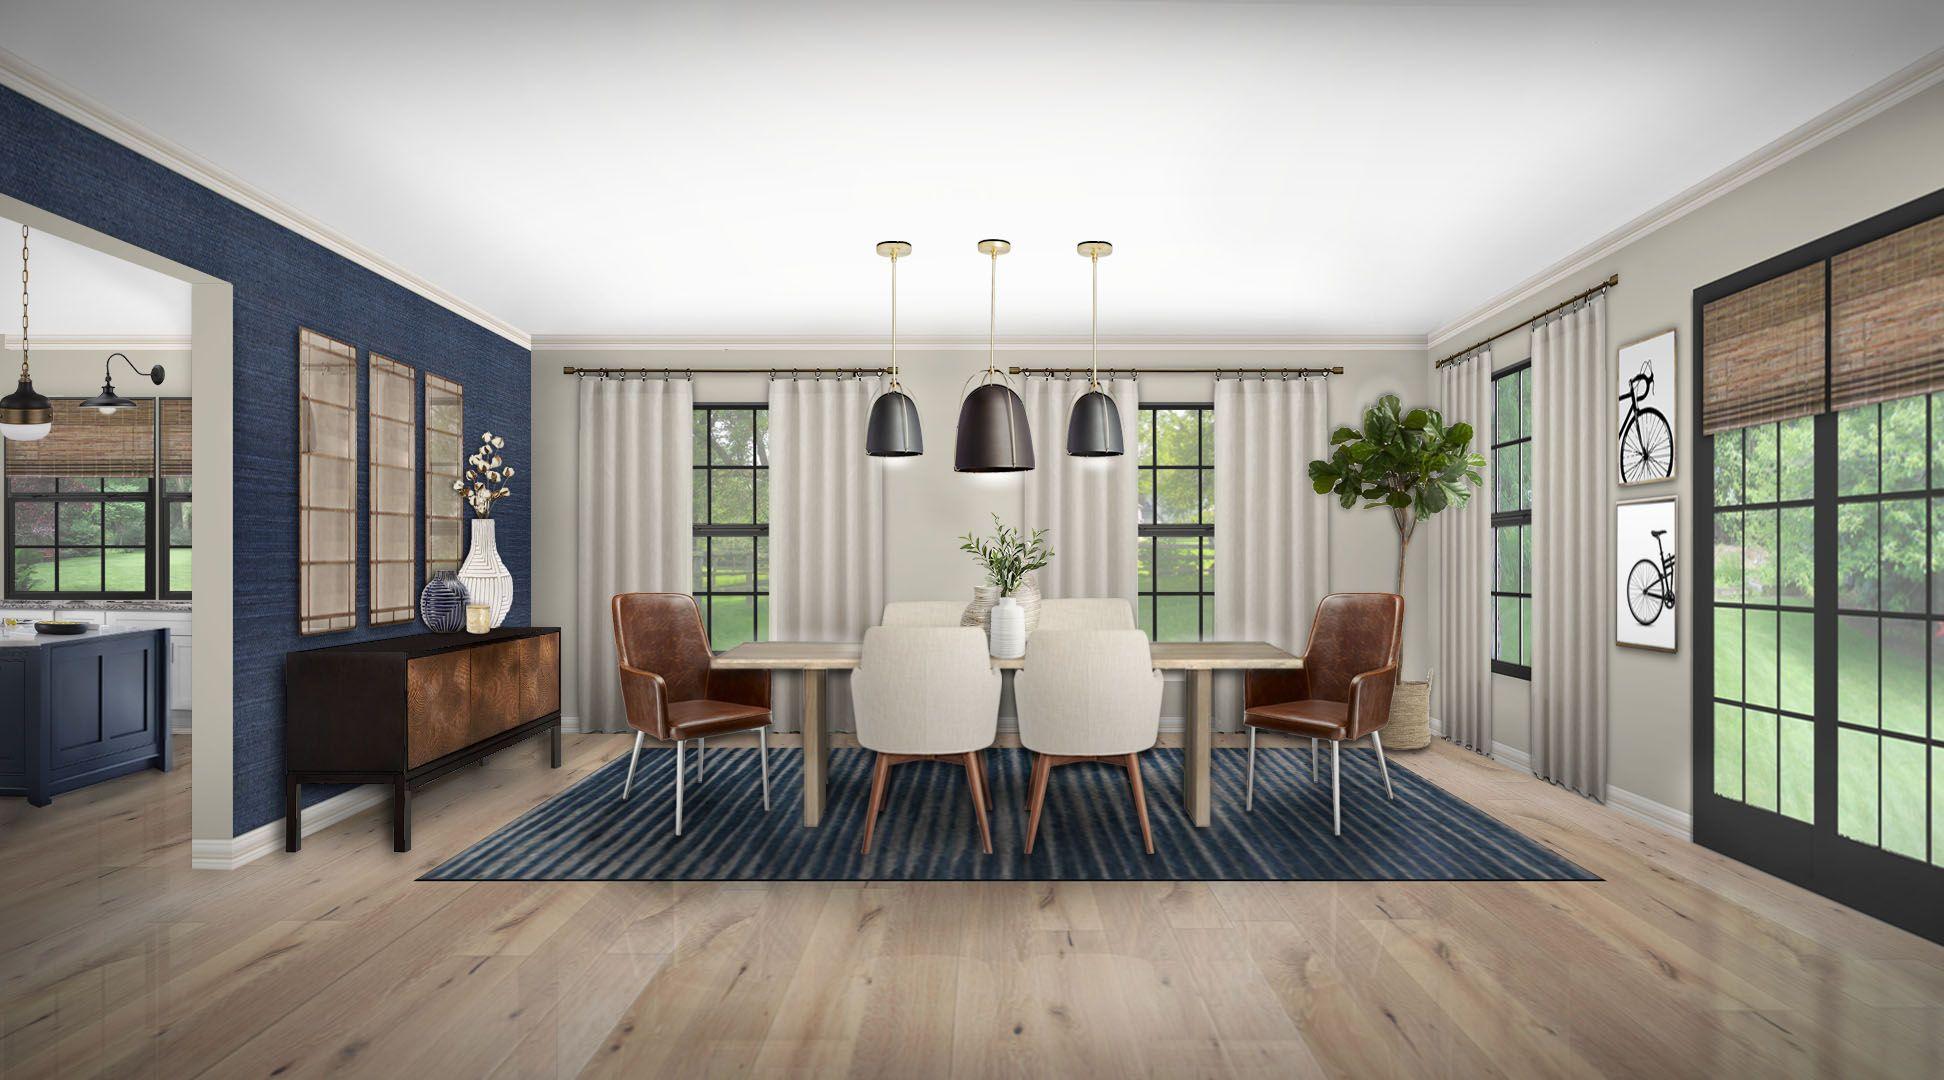 photoshop interior design kit - google search | interior